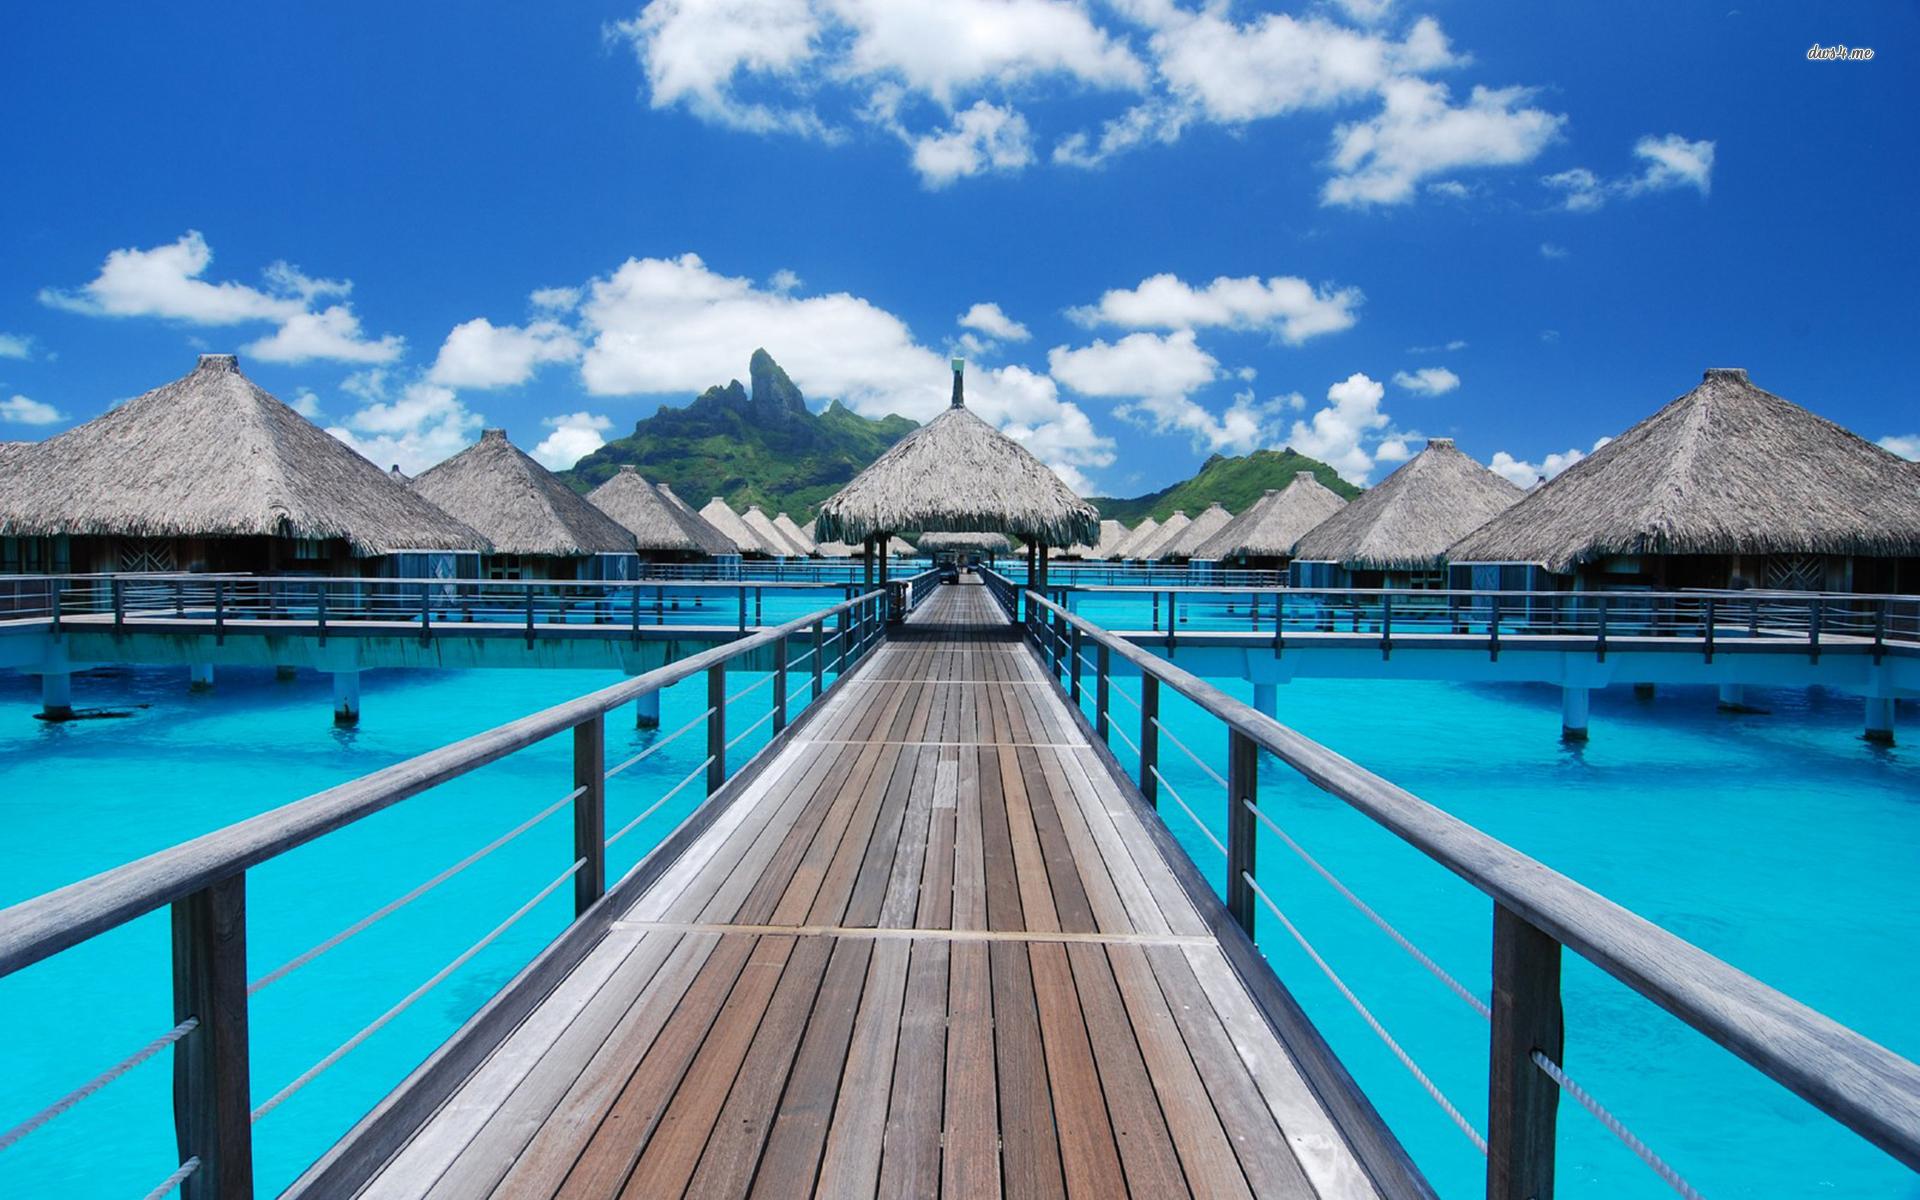 https://tahititourisme.ca/wp-content/uploads/2017/11/35360-the-st-regis-bora-bora-resort-villas-1920x1200-beach-wallpaper.jpg